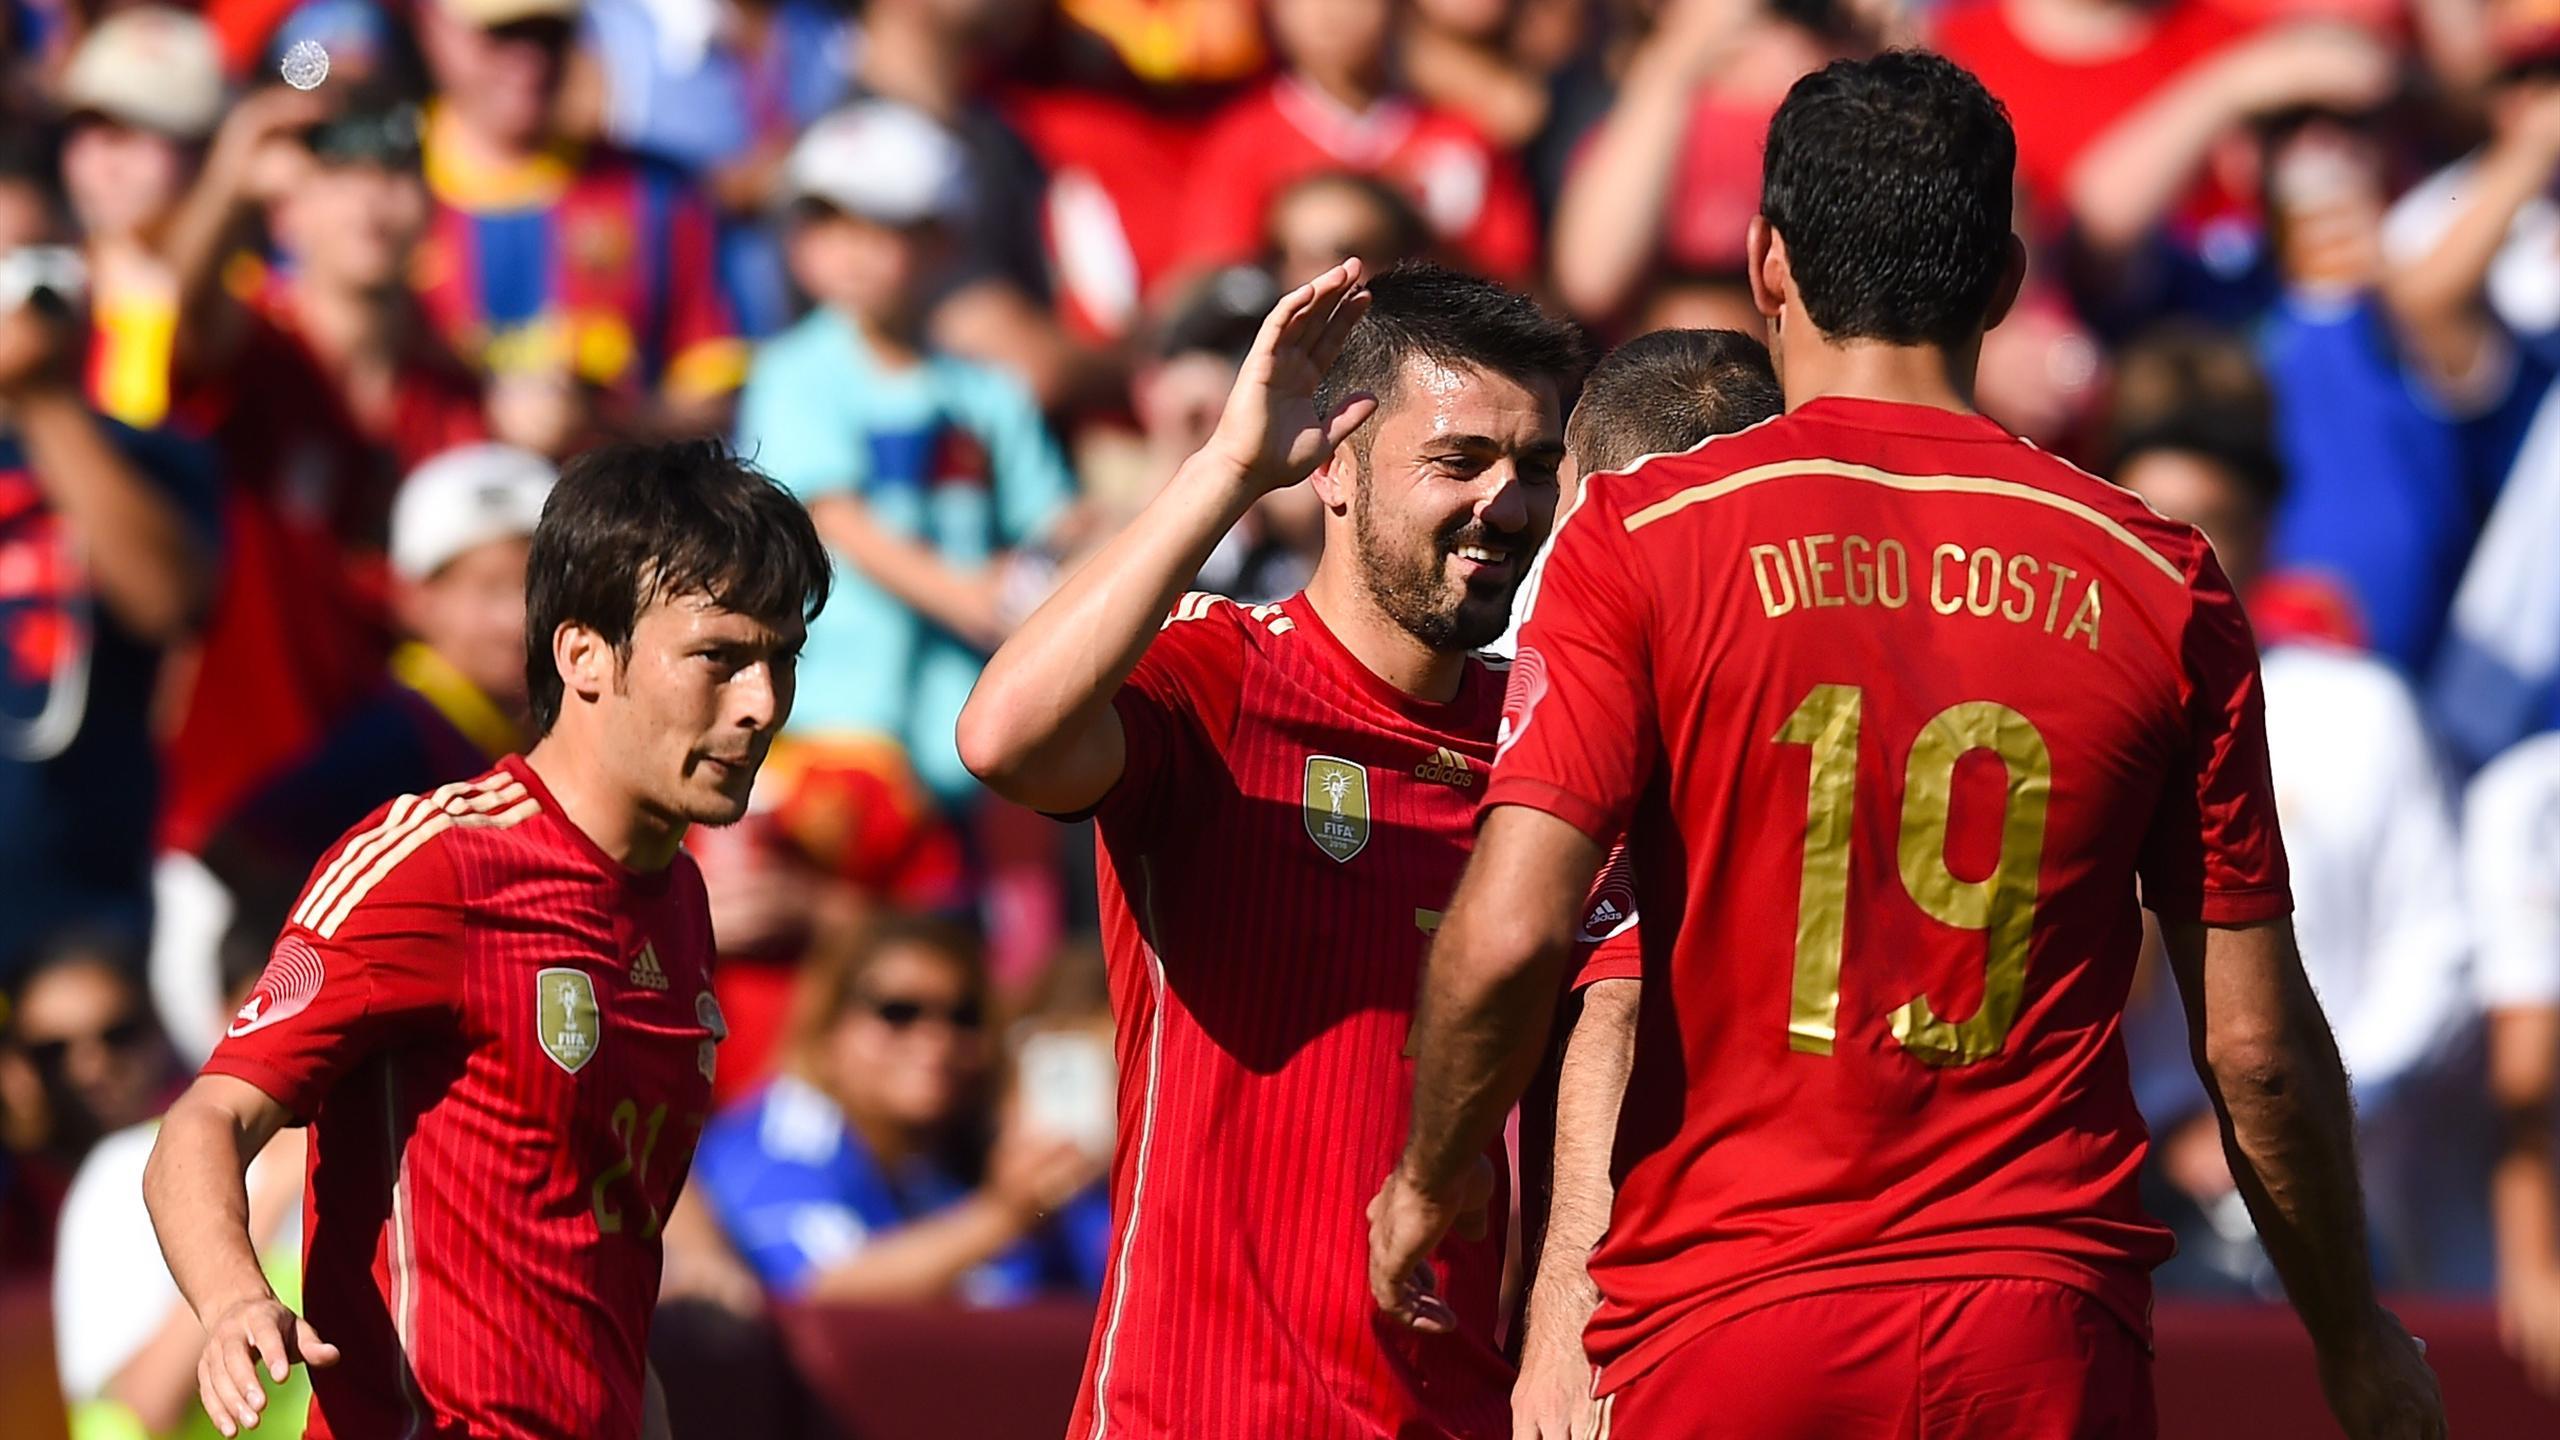 International friendlies - Villa double guides Spain to victory over El Salvador